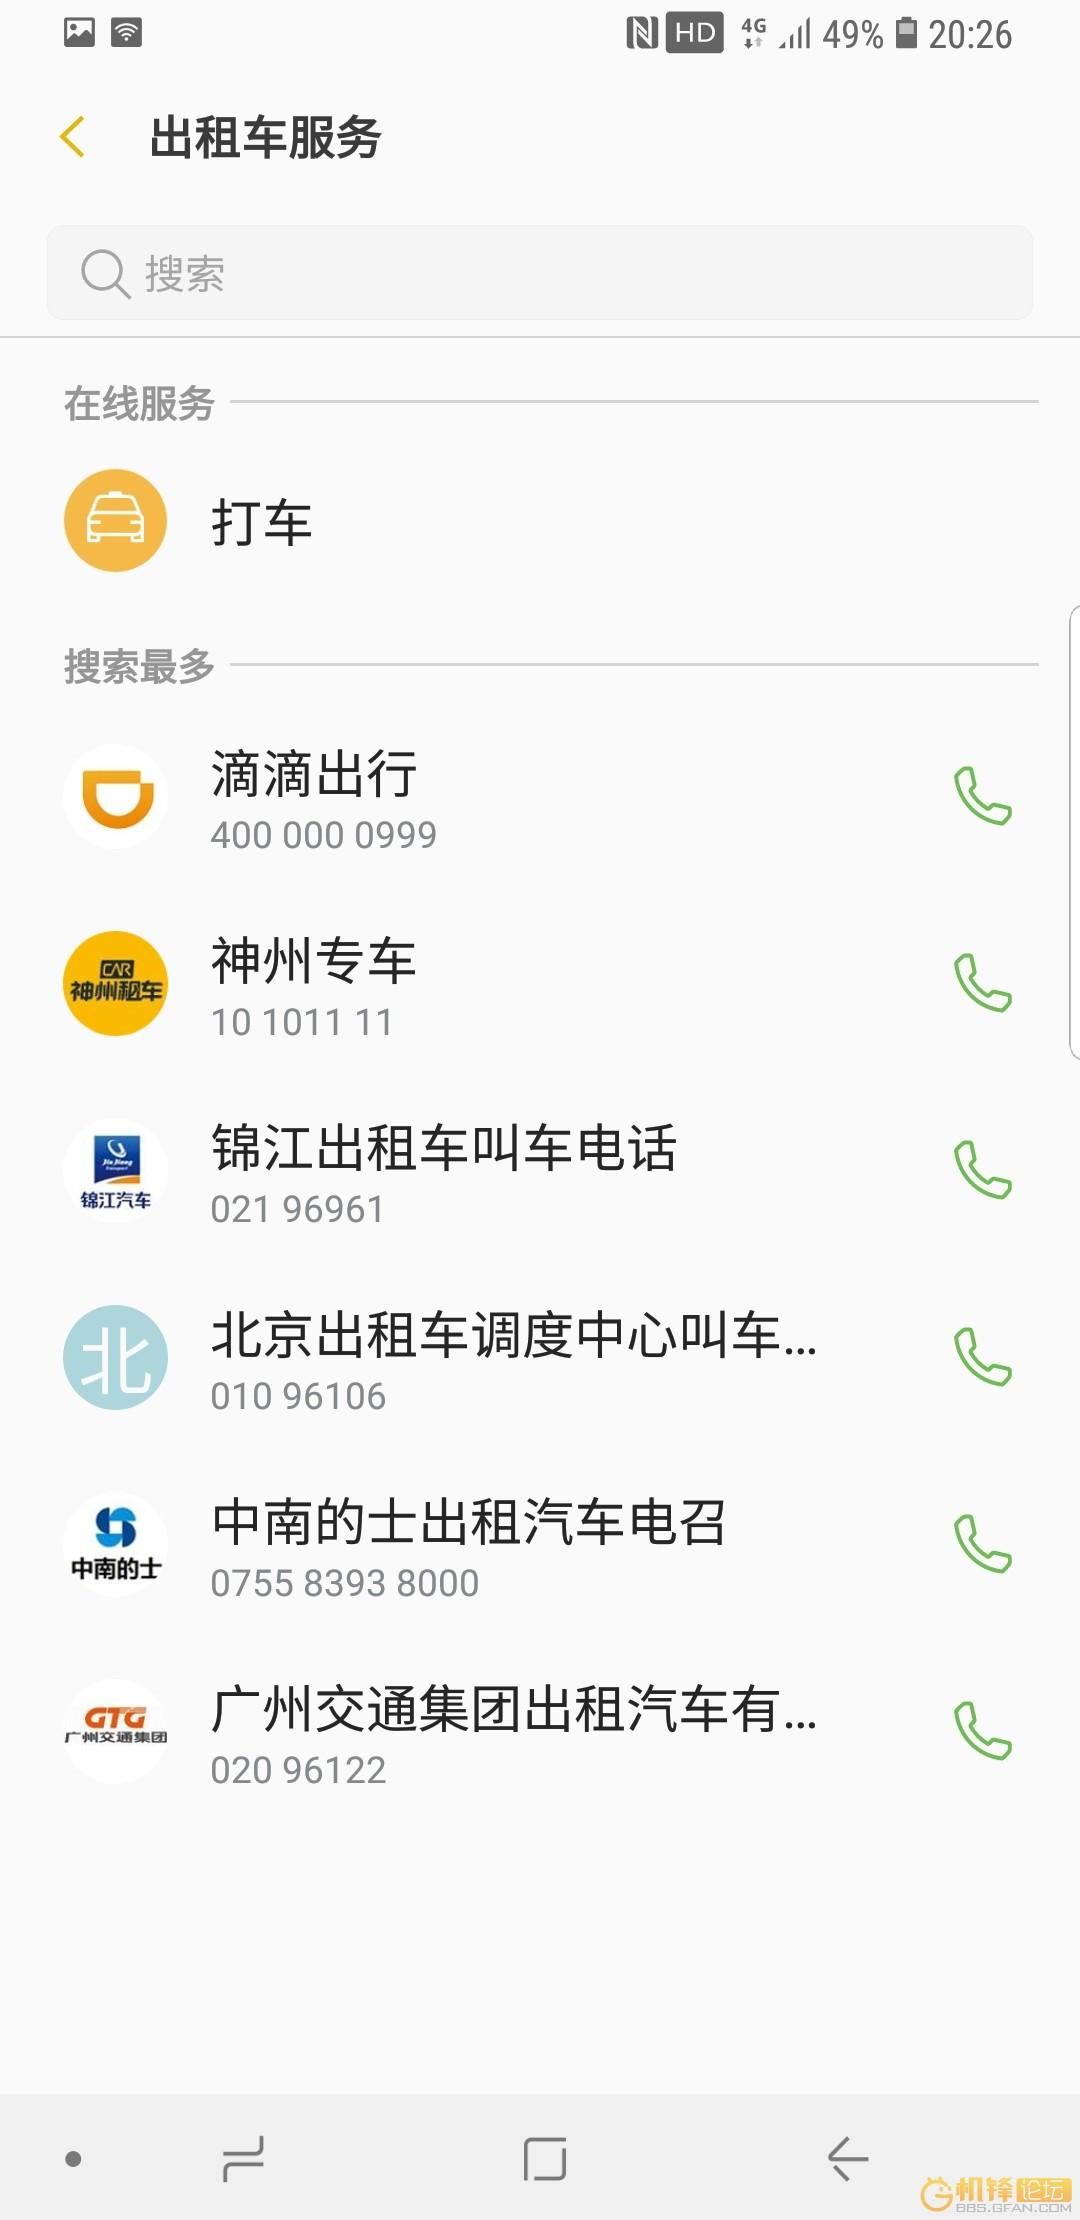 Screenshot_Yellow Pages_20171225-202614.jpg